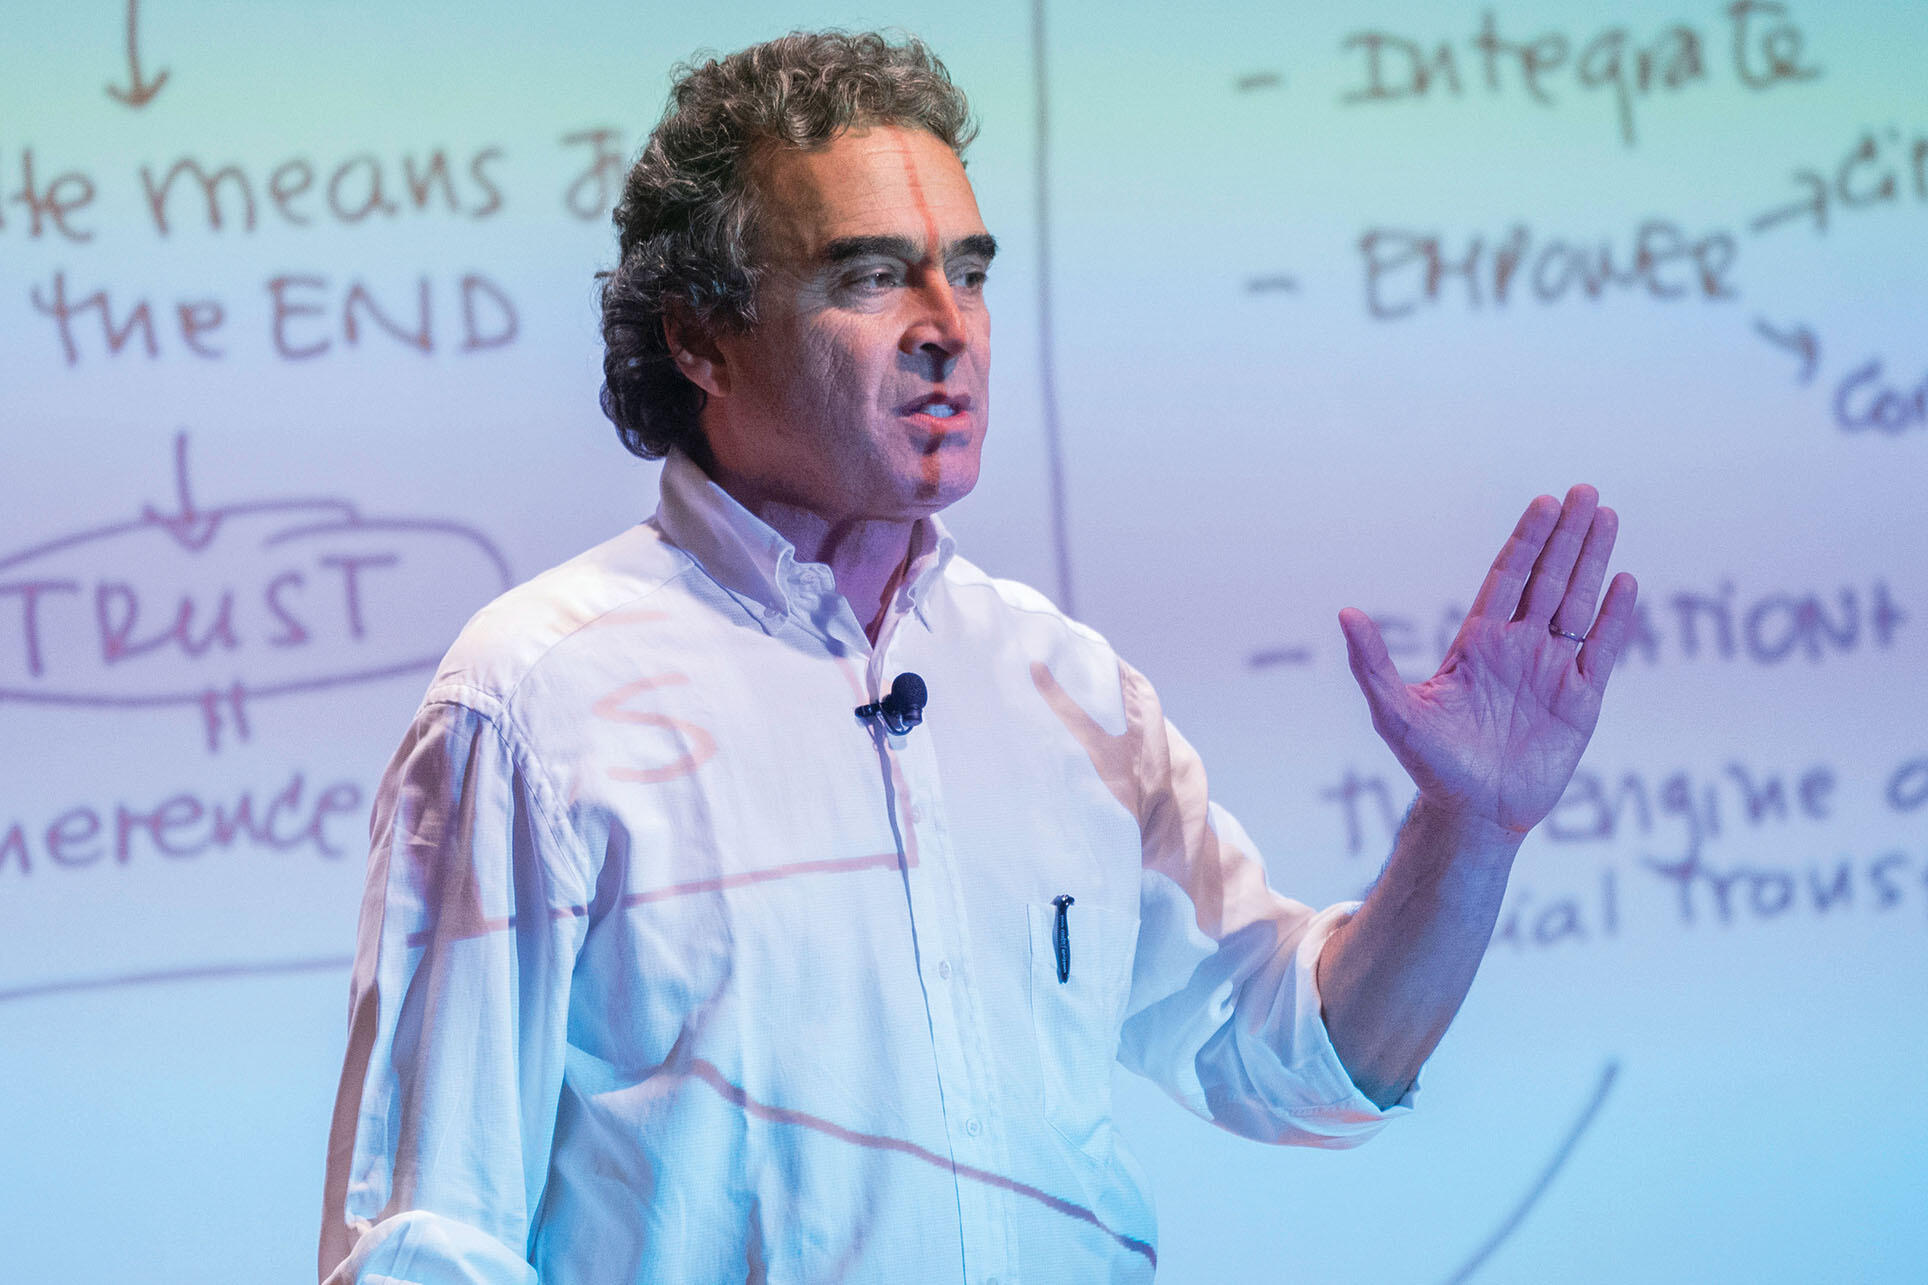 Sergio Fajardo speaks on campus during a visit to Berkeley, October 2018. (Photo by Jim Block.)